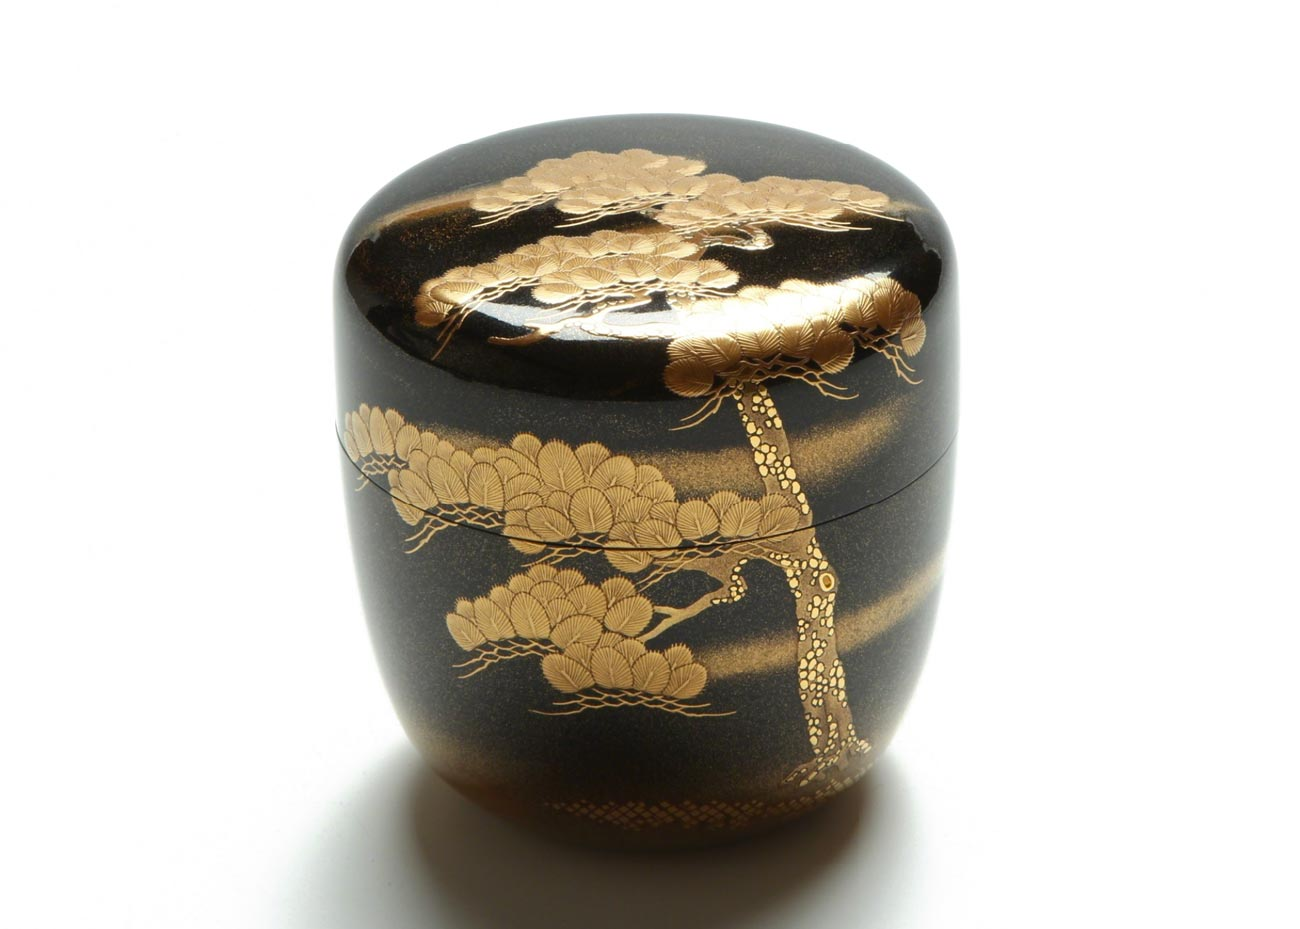 © Kiyose Ikko, Pine Tree Lacquer Tea Caddy